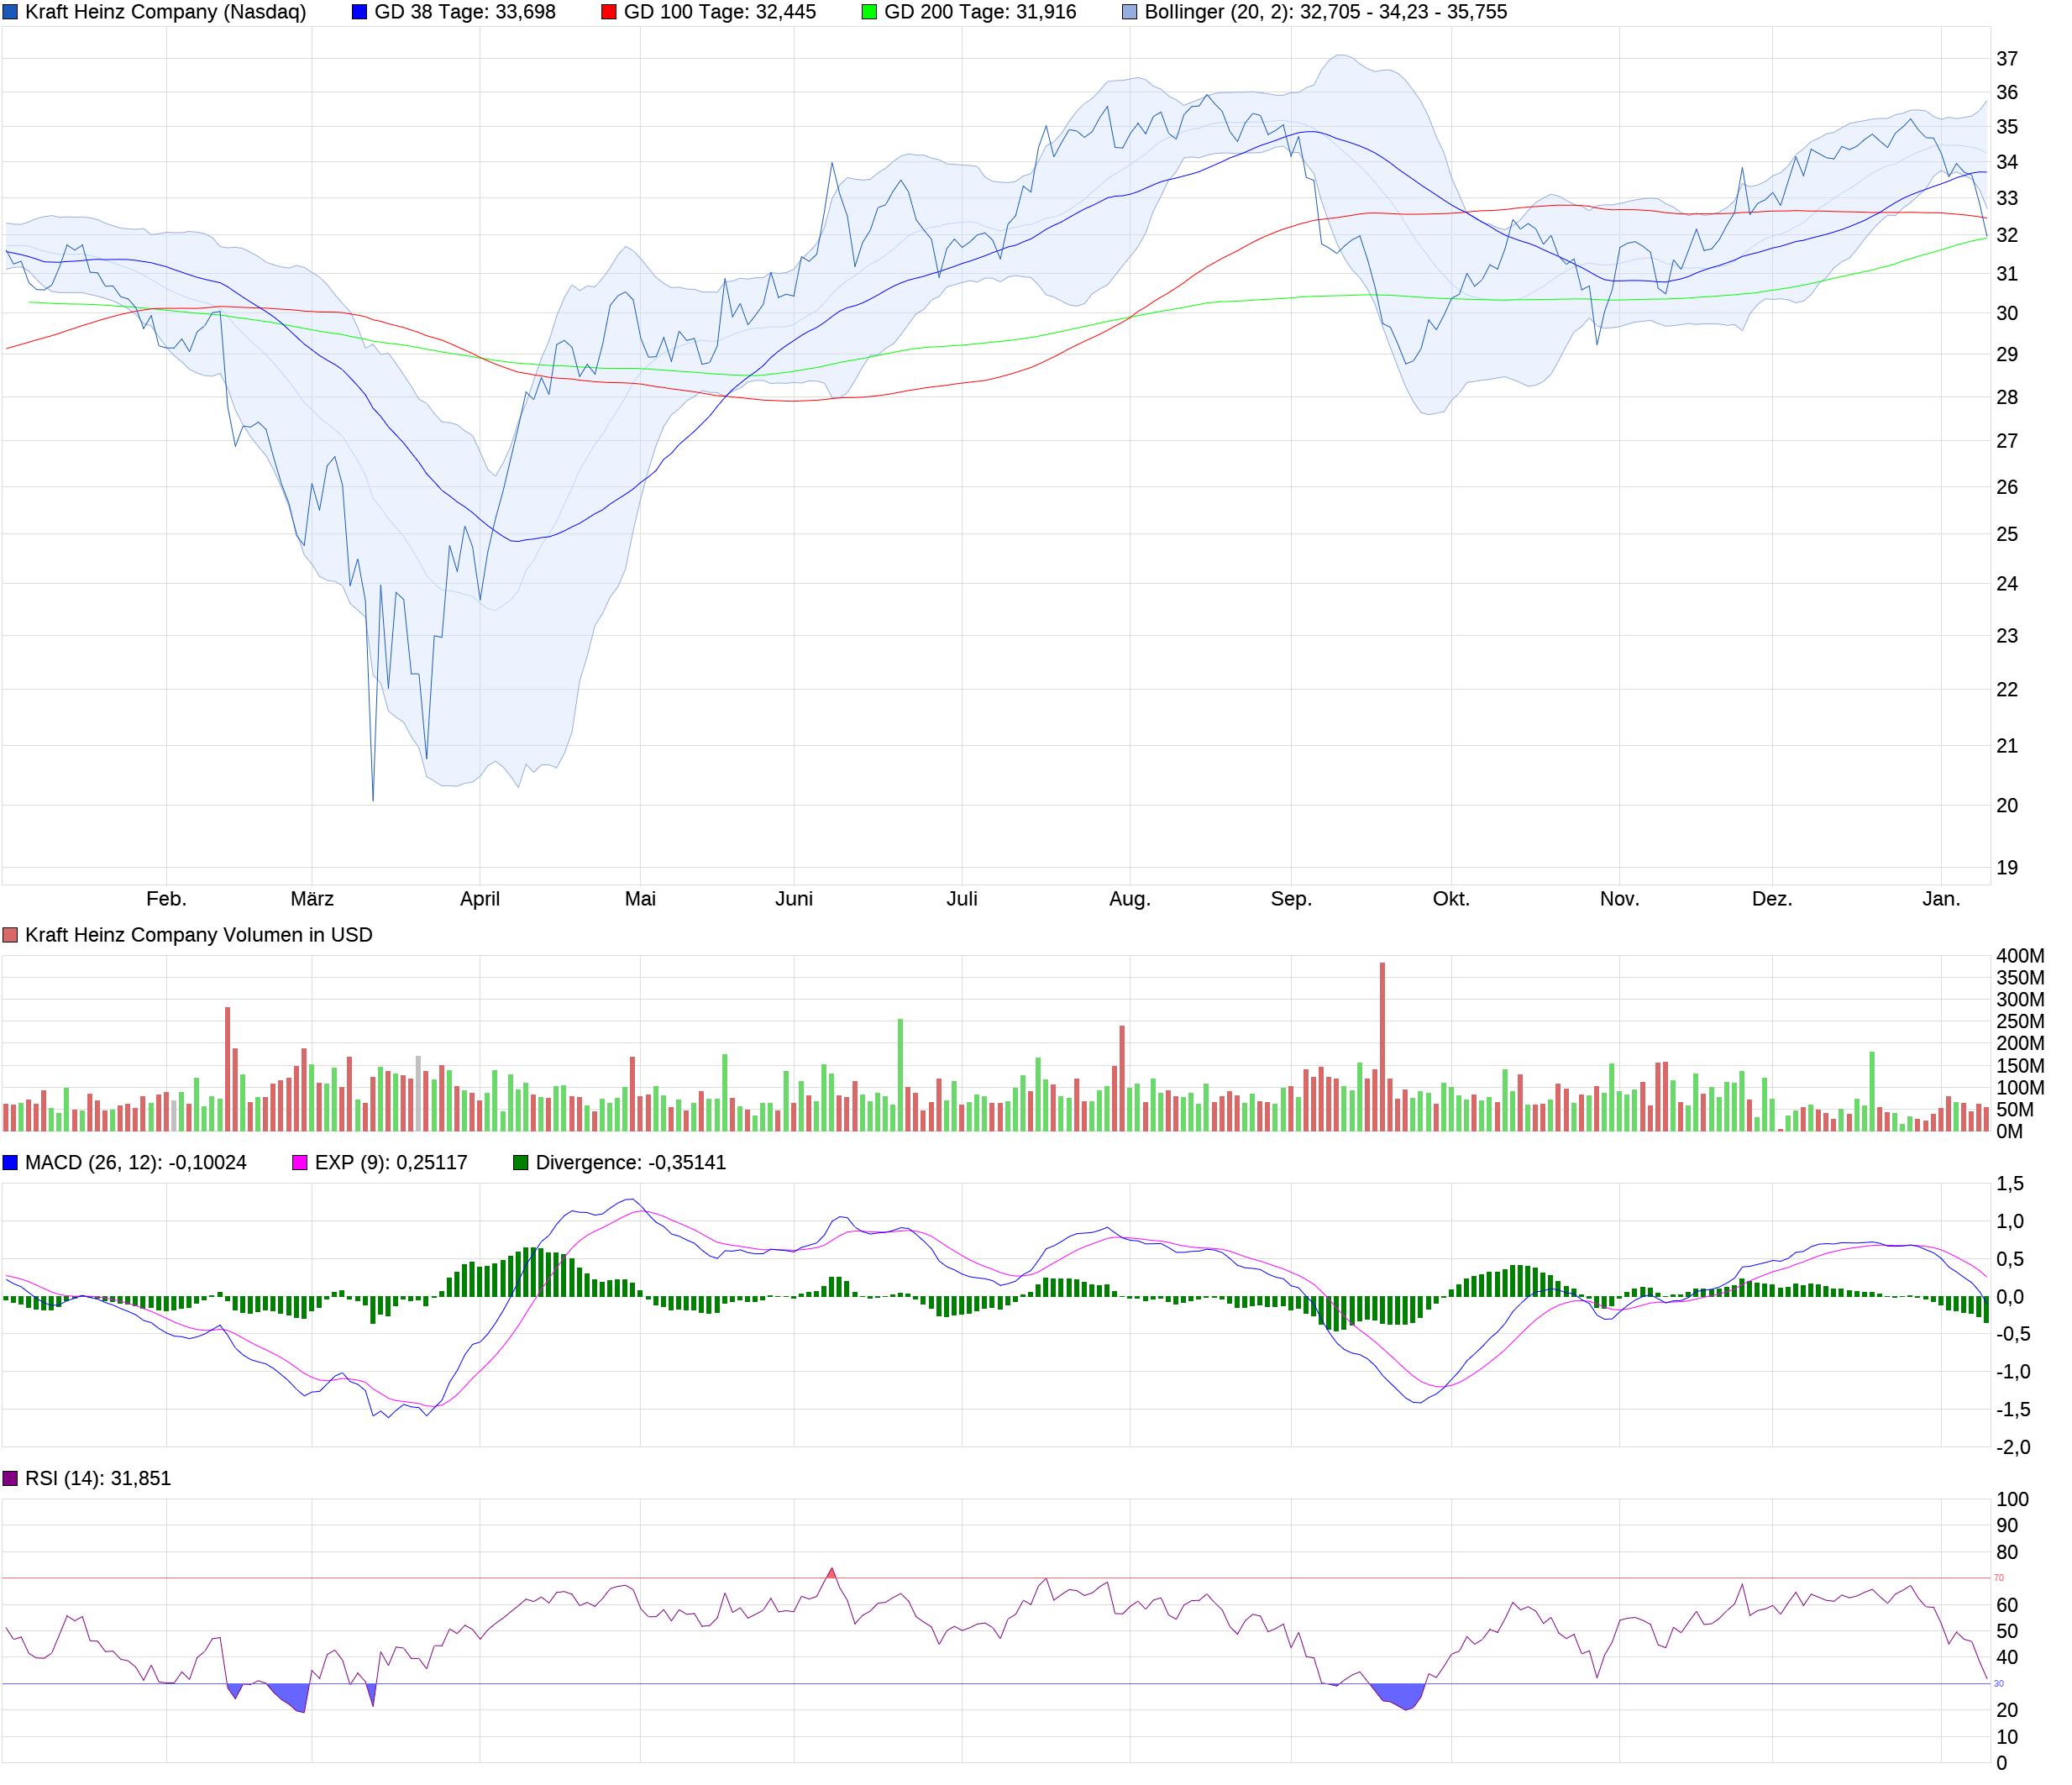 chart_year_kraftheinzcompany.png